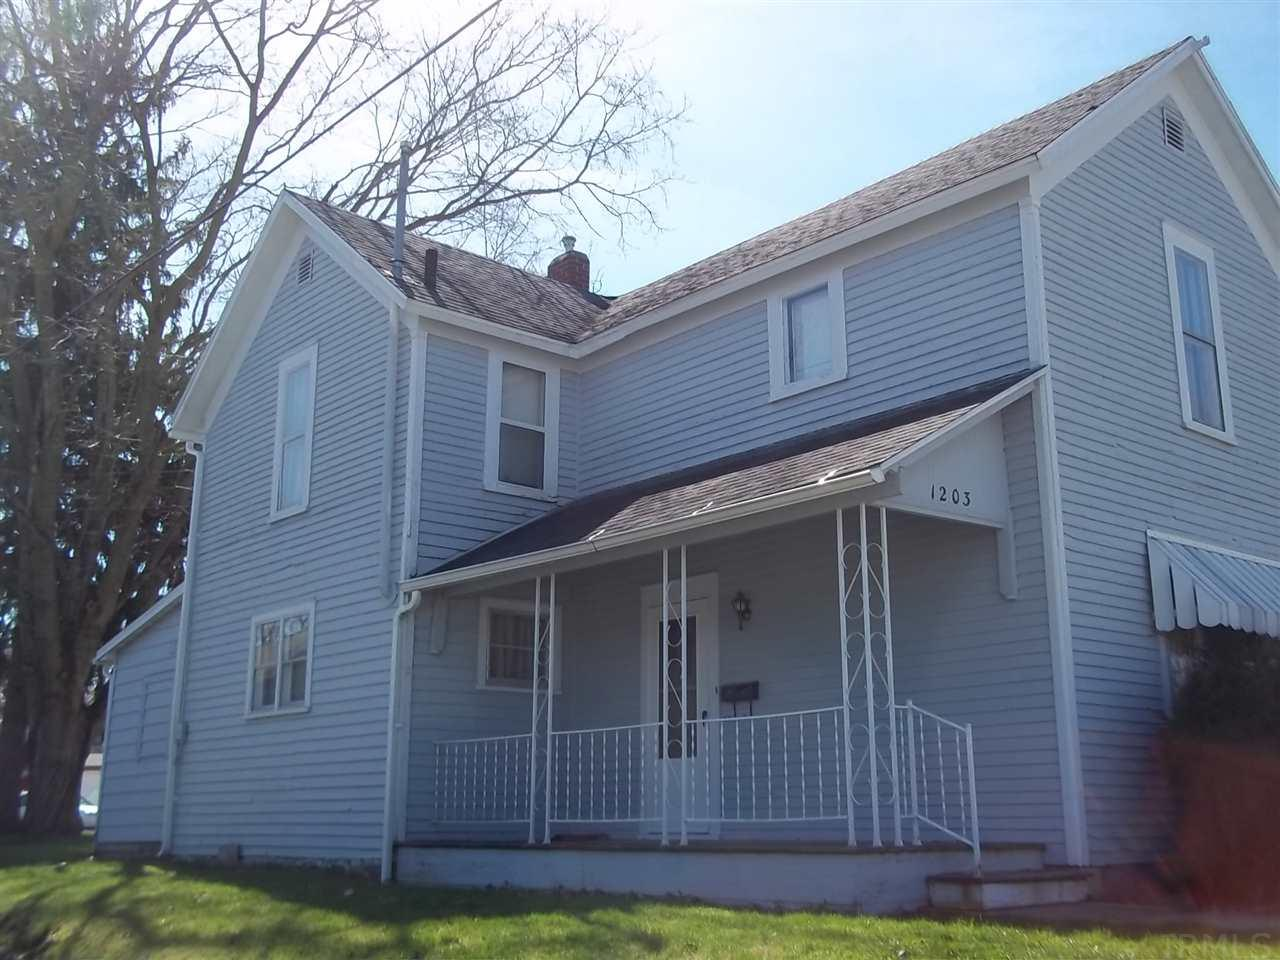 1203 ELM, Huntington, IN 46750